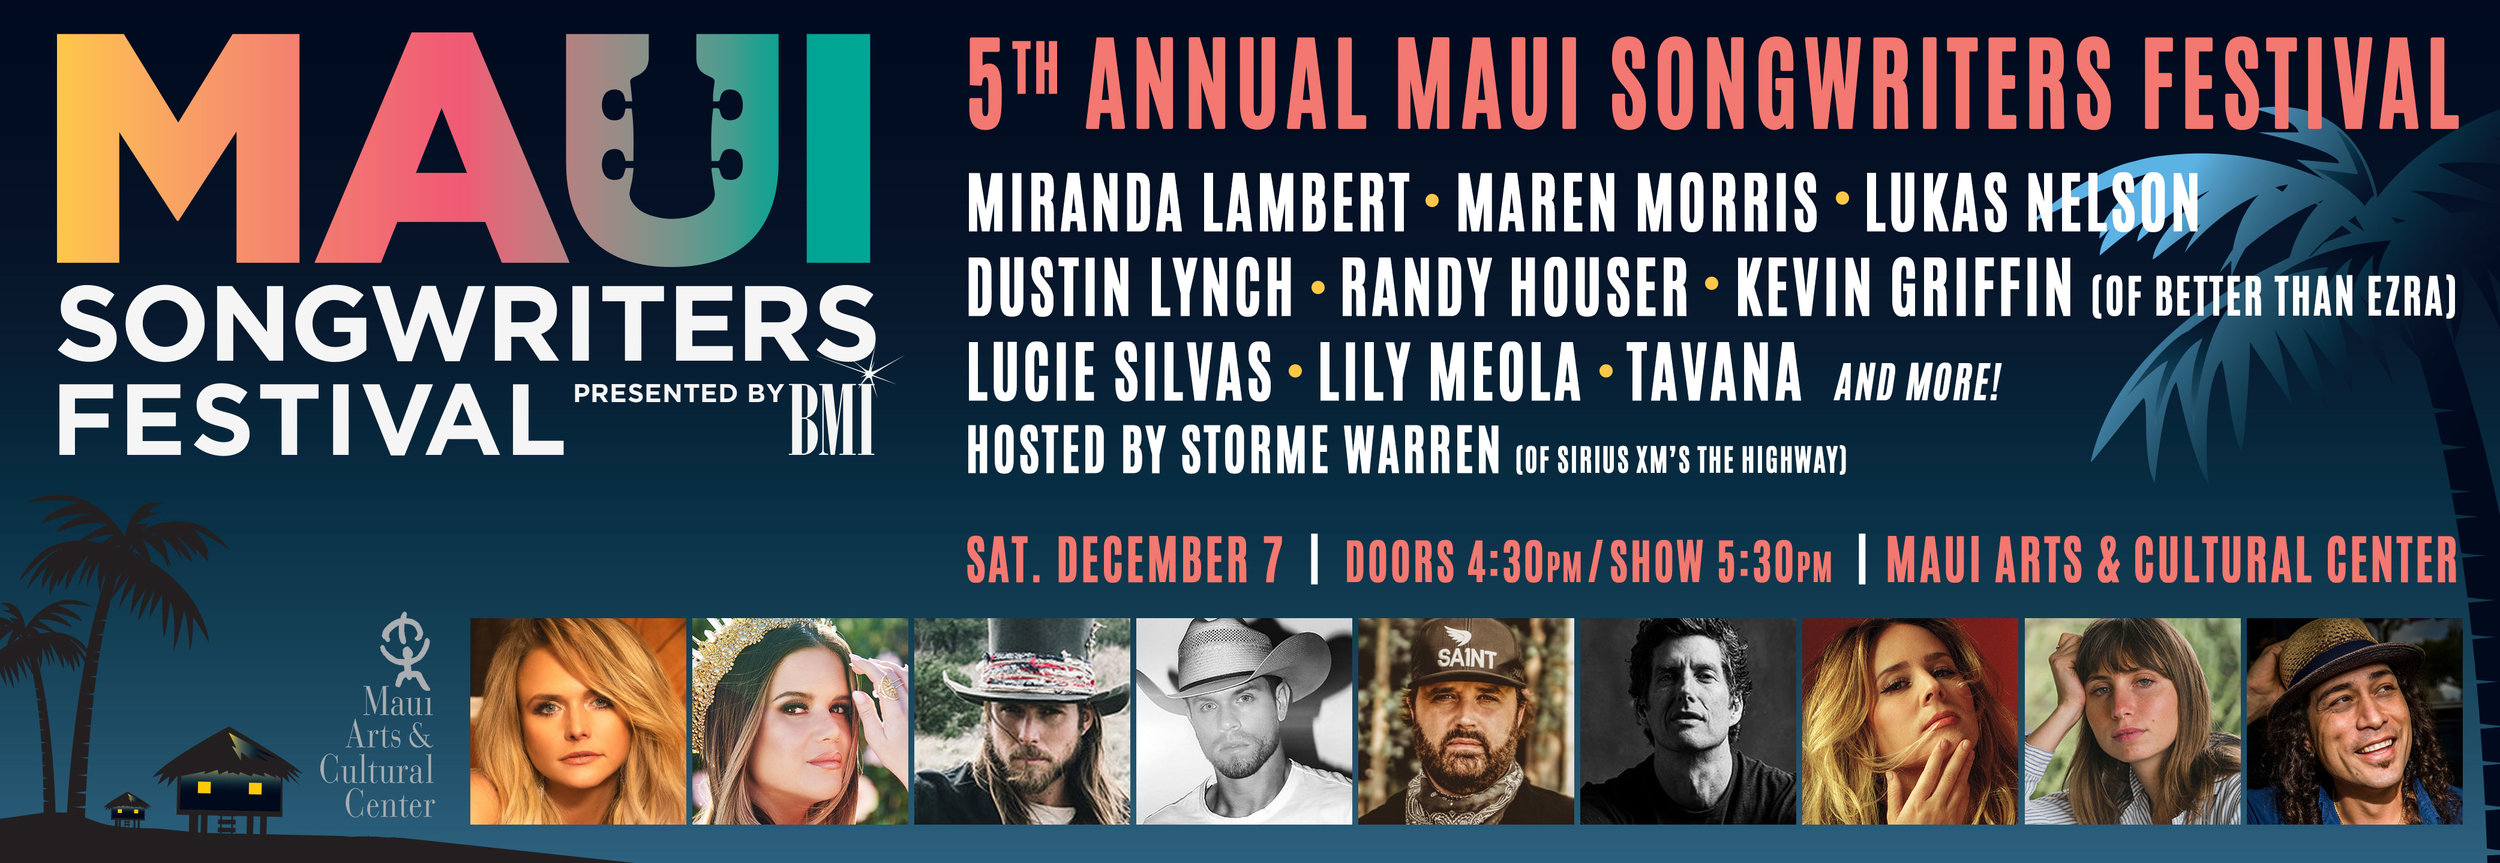 Maui19_Web_Festival.jpg